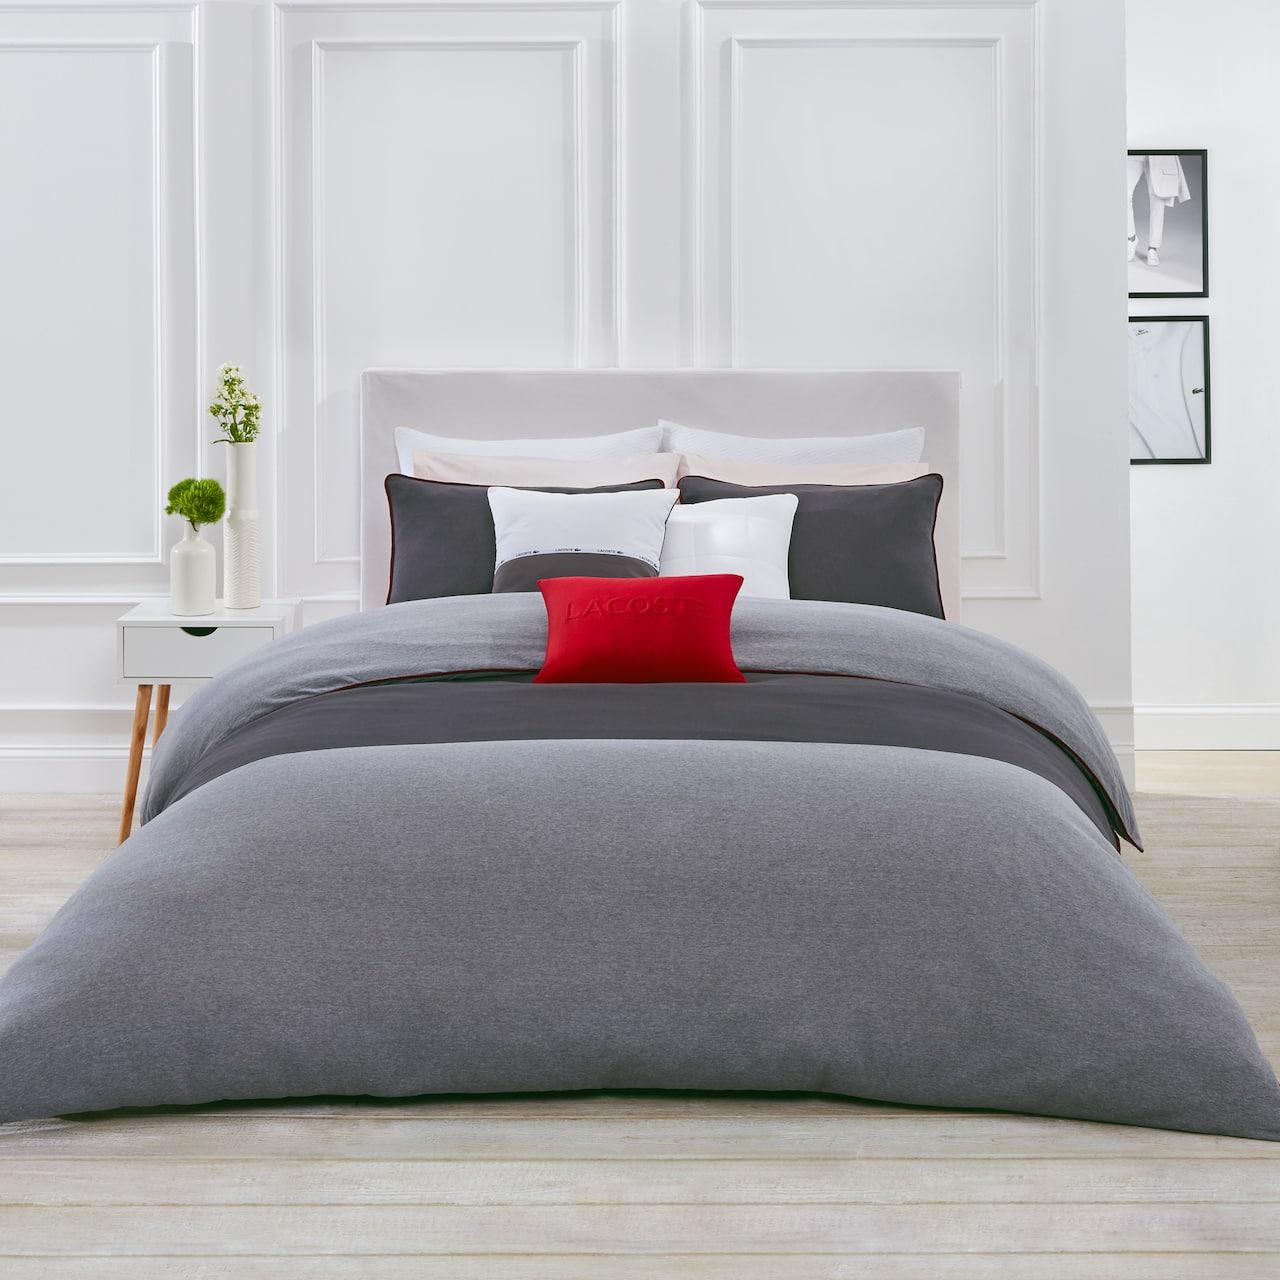 L.12.12 Grey Comforter Set